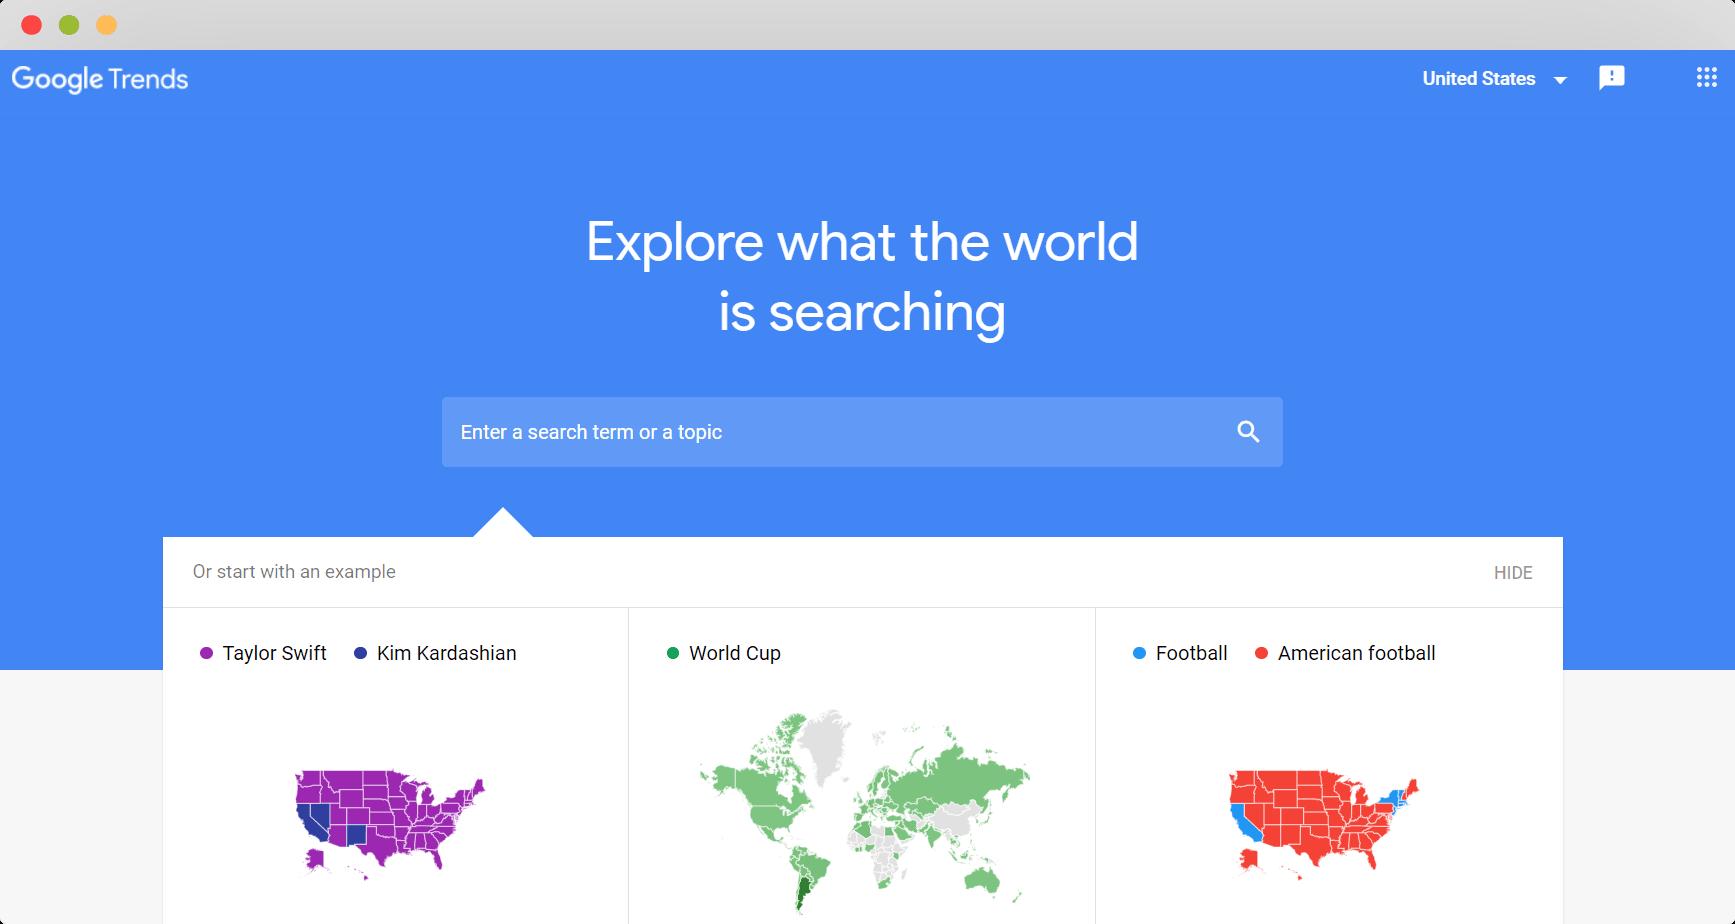 Figure 6 Google Trends